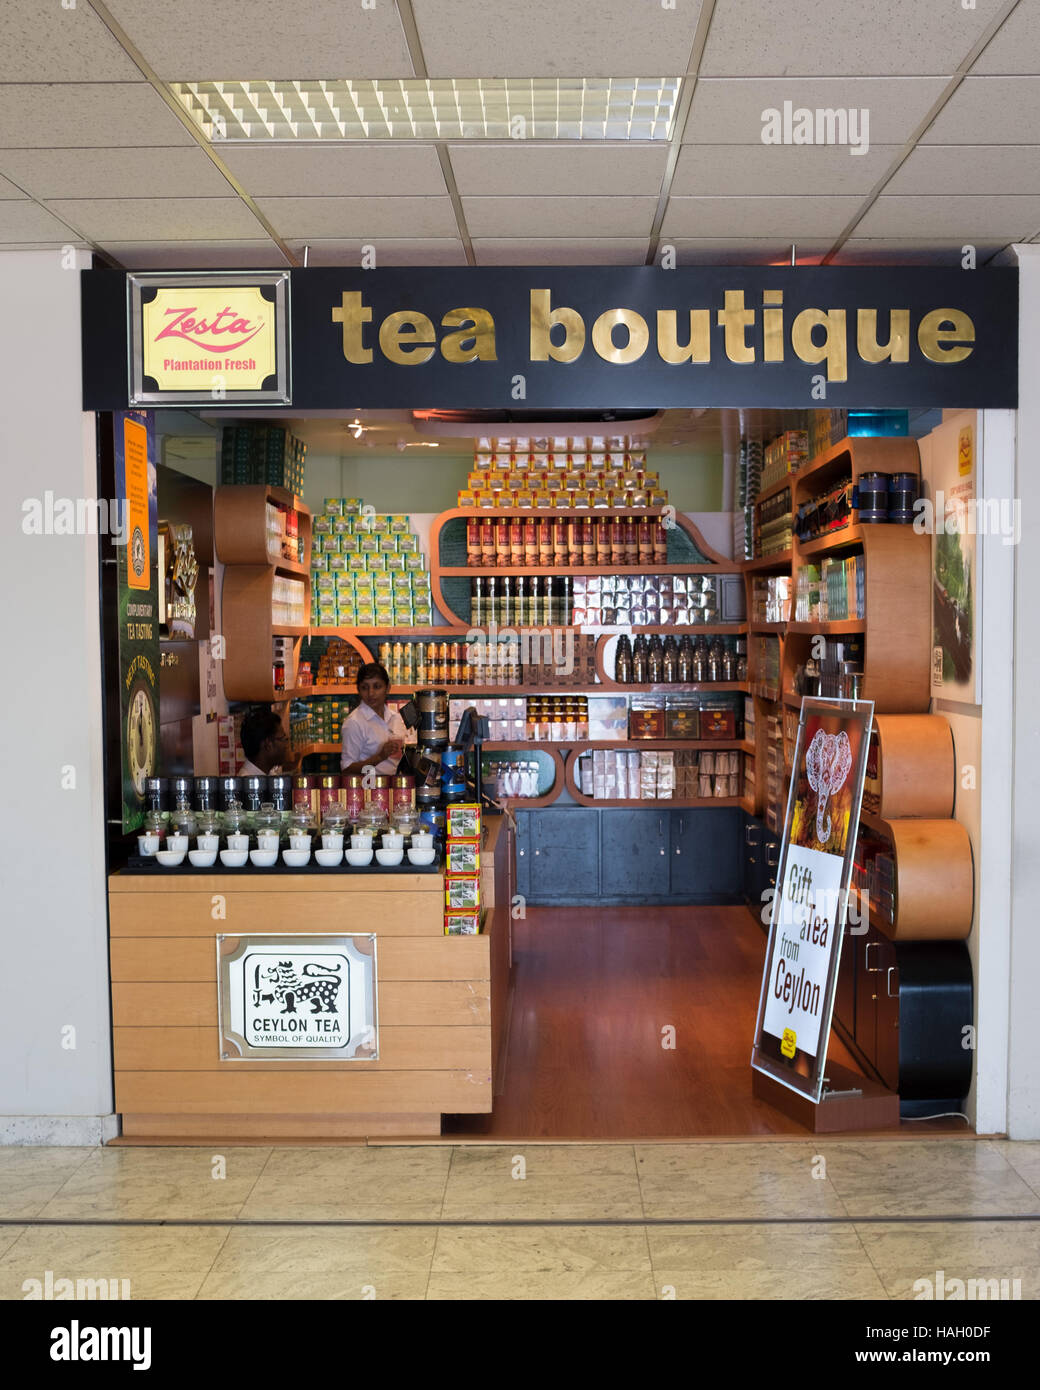 Local tea shop stock photos local tea shop stock images for Local wallpaper shops